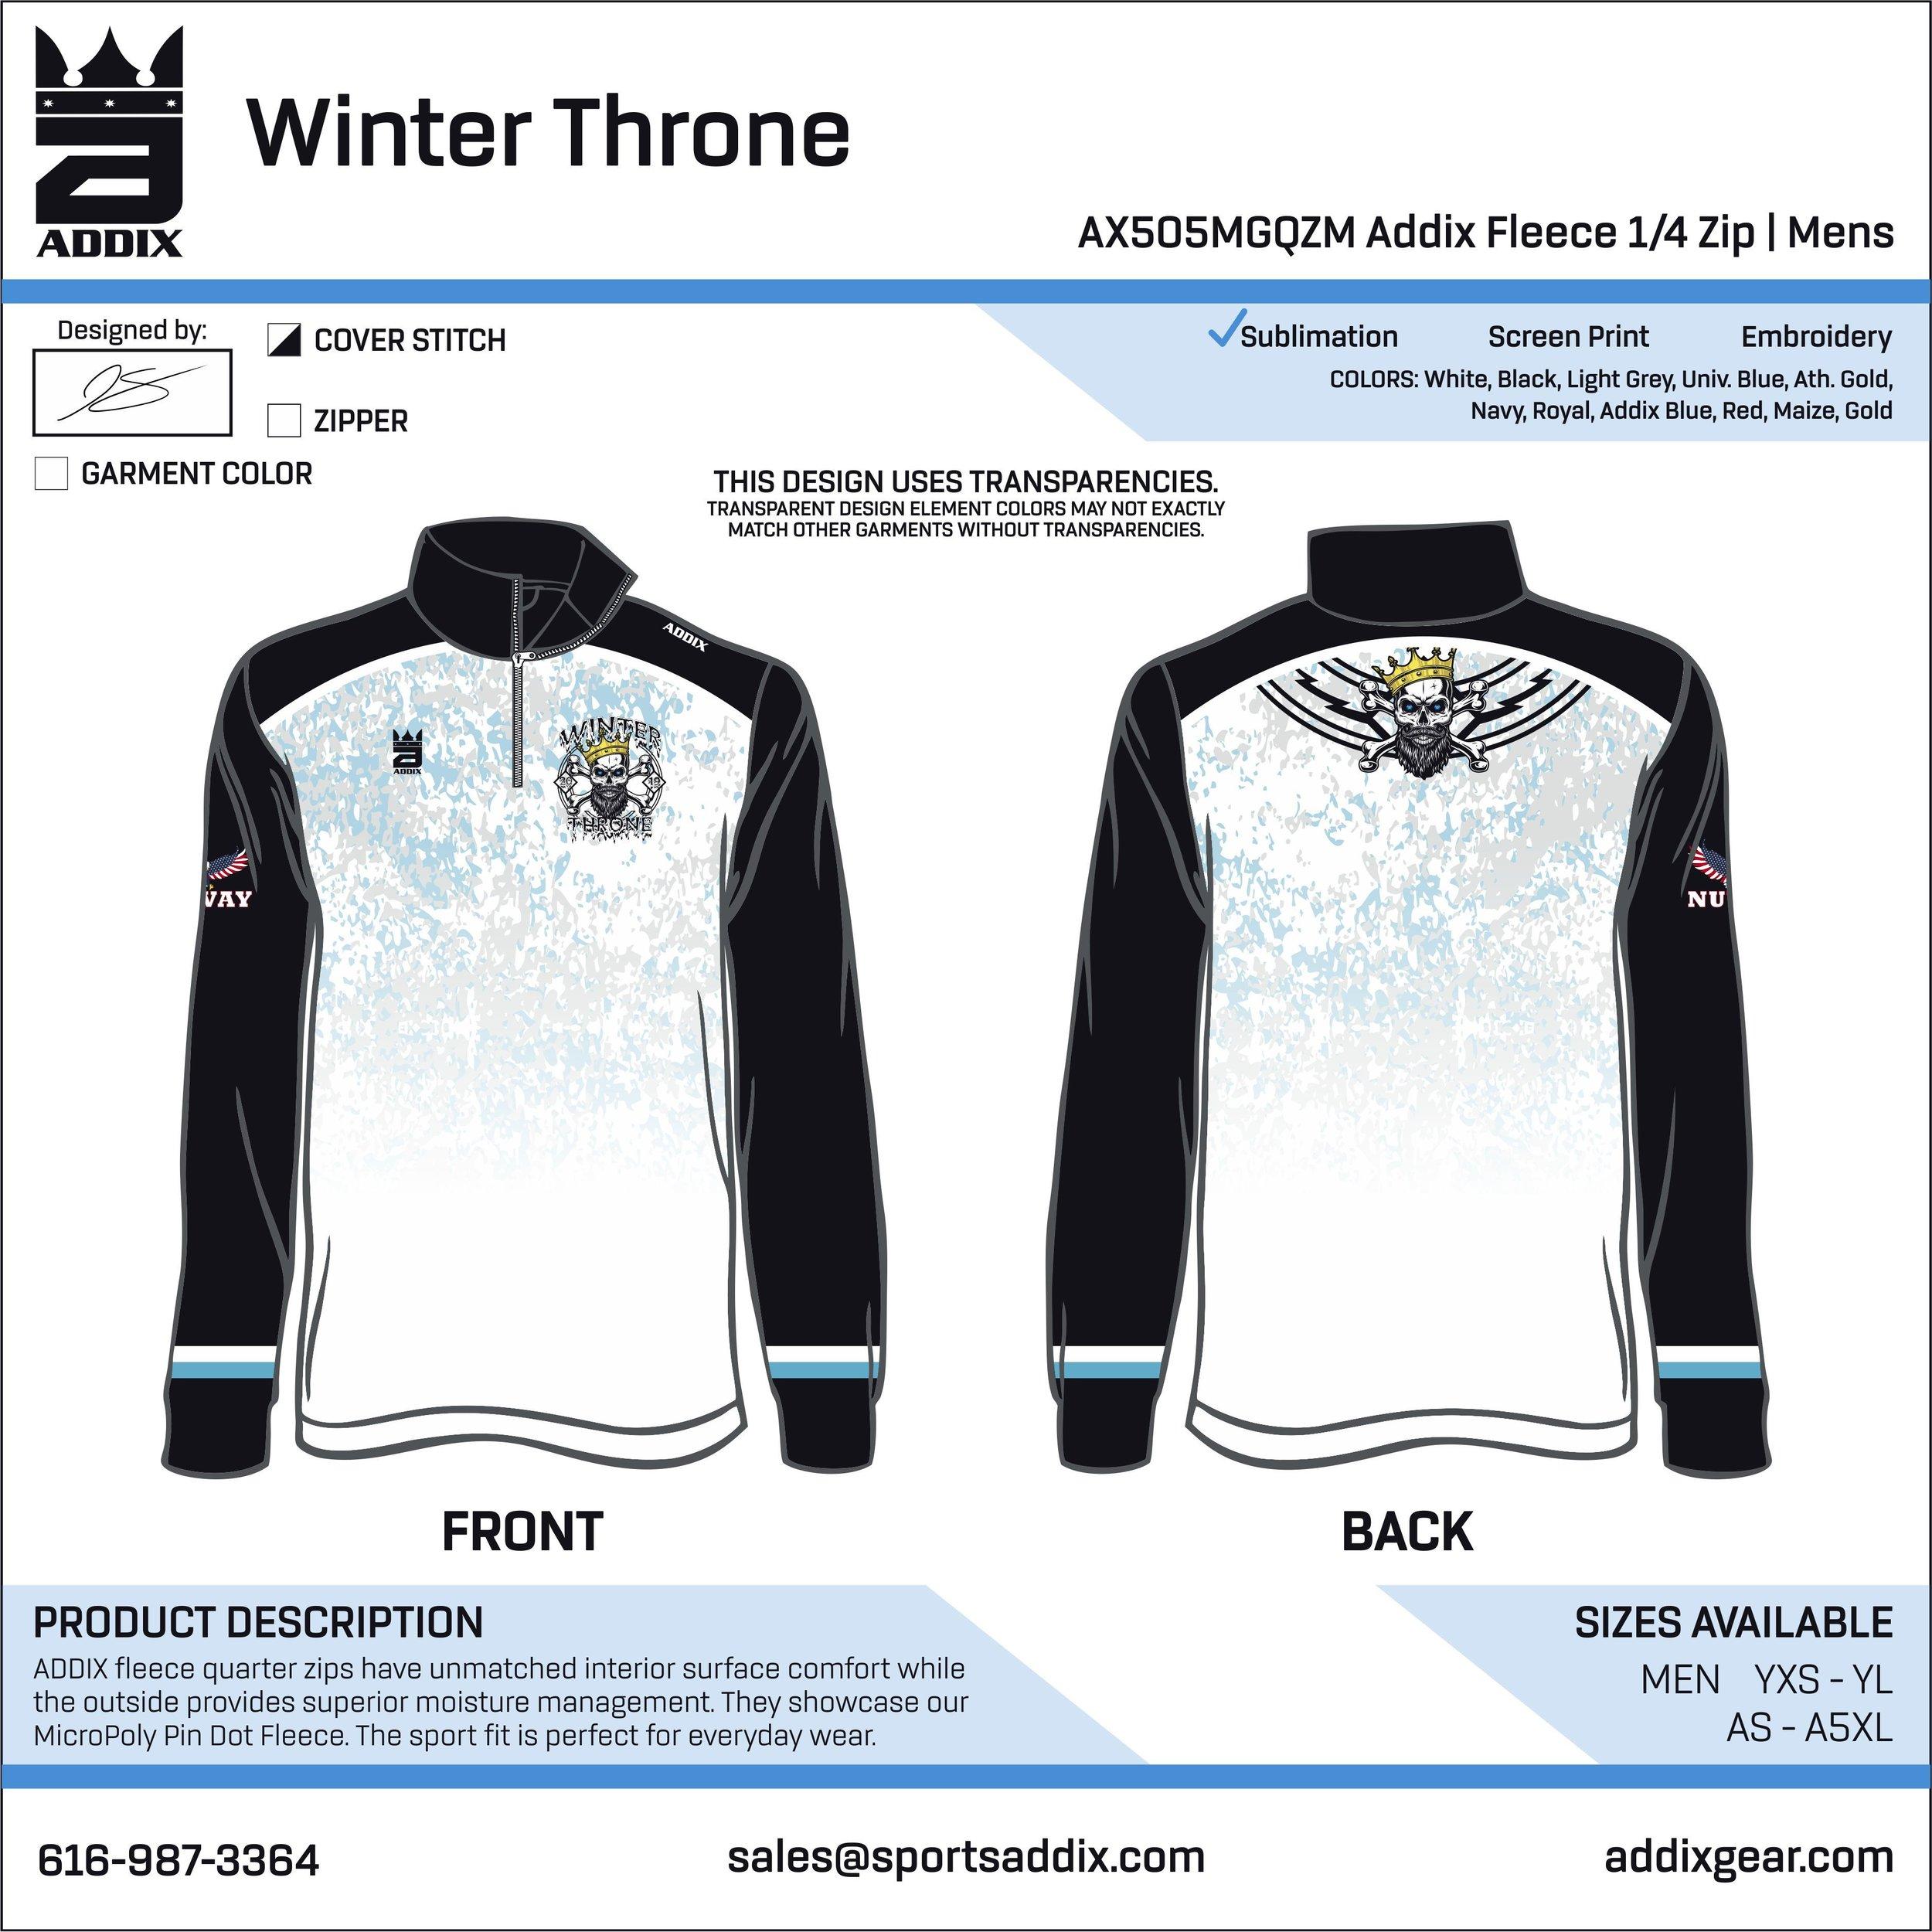 Winter Throne V2_2018_12-28_JE_QZ Full Sub.jpg